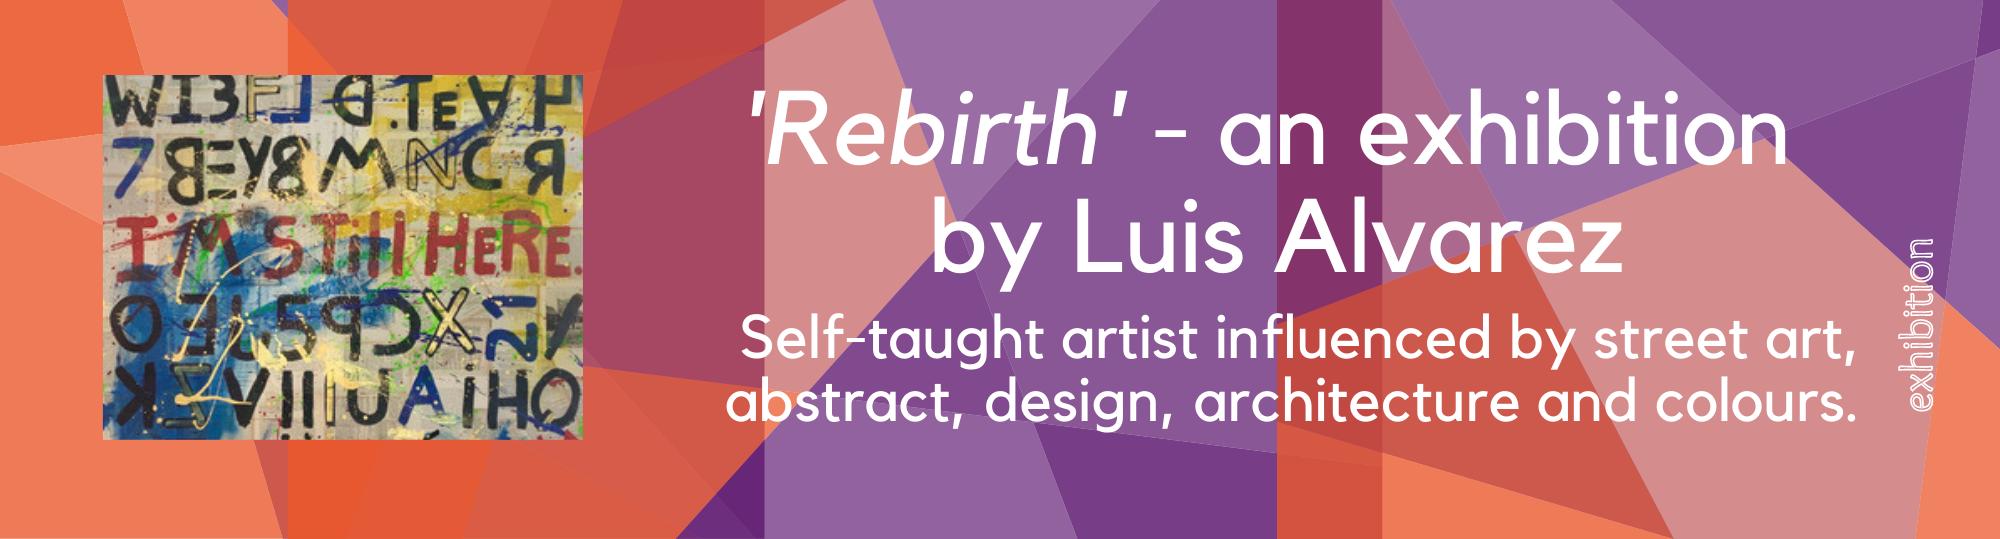 Luis Alvarez Exhibition - Greenwich